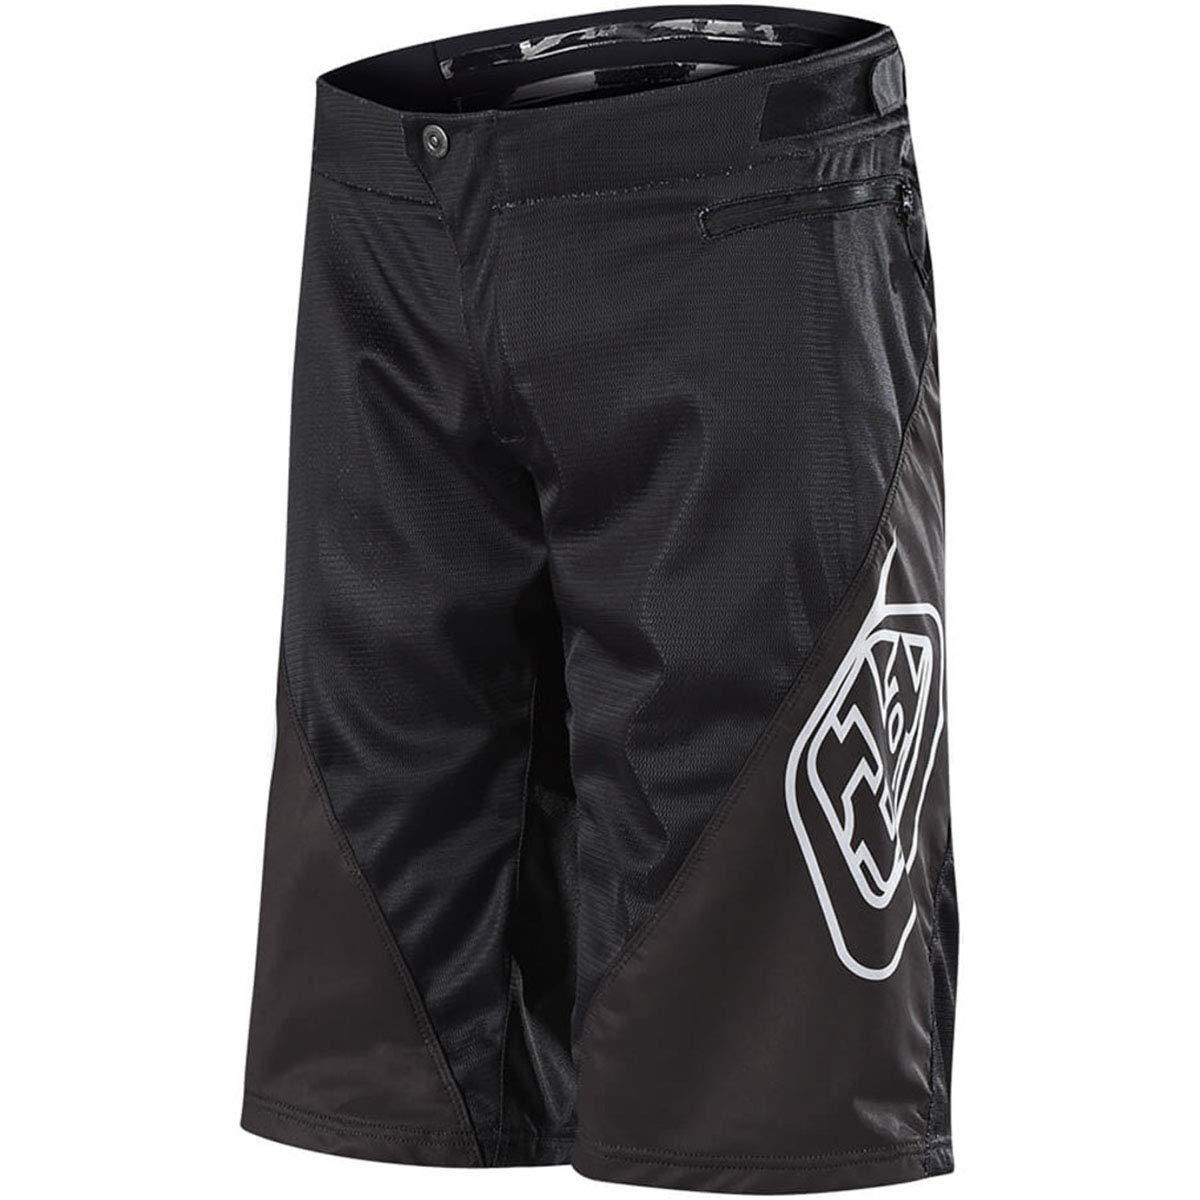 Troy Lee Designs Sprint Shorts - Boys' Solid Black, 28 by Troy Lee Designs